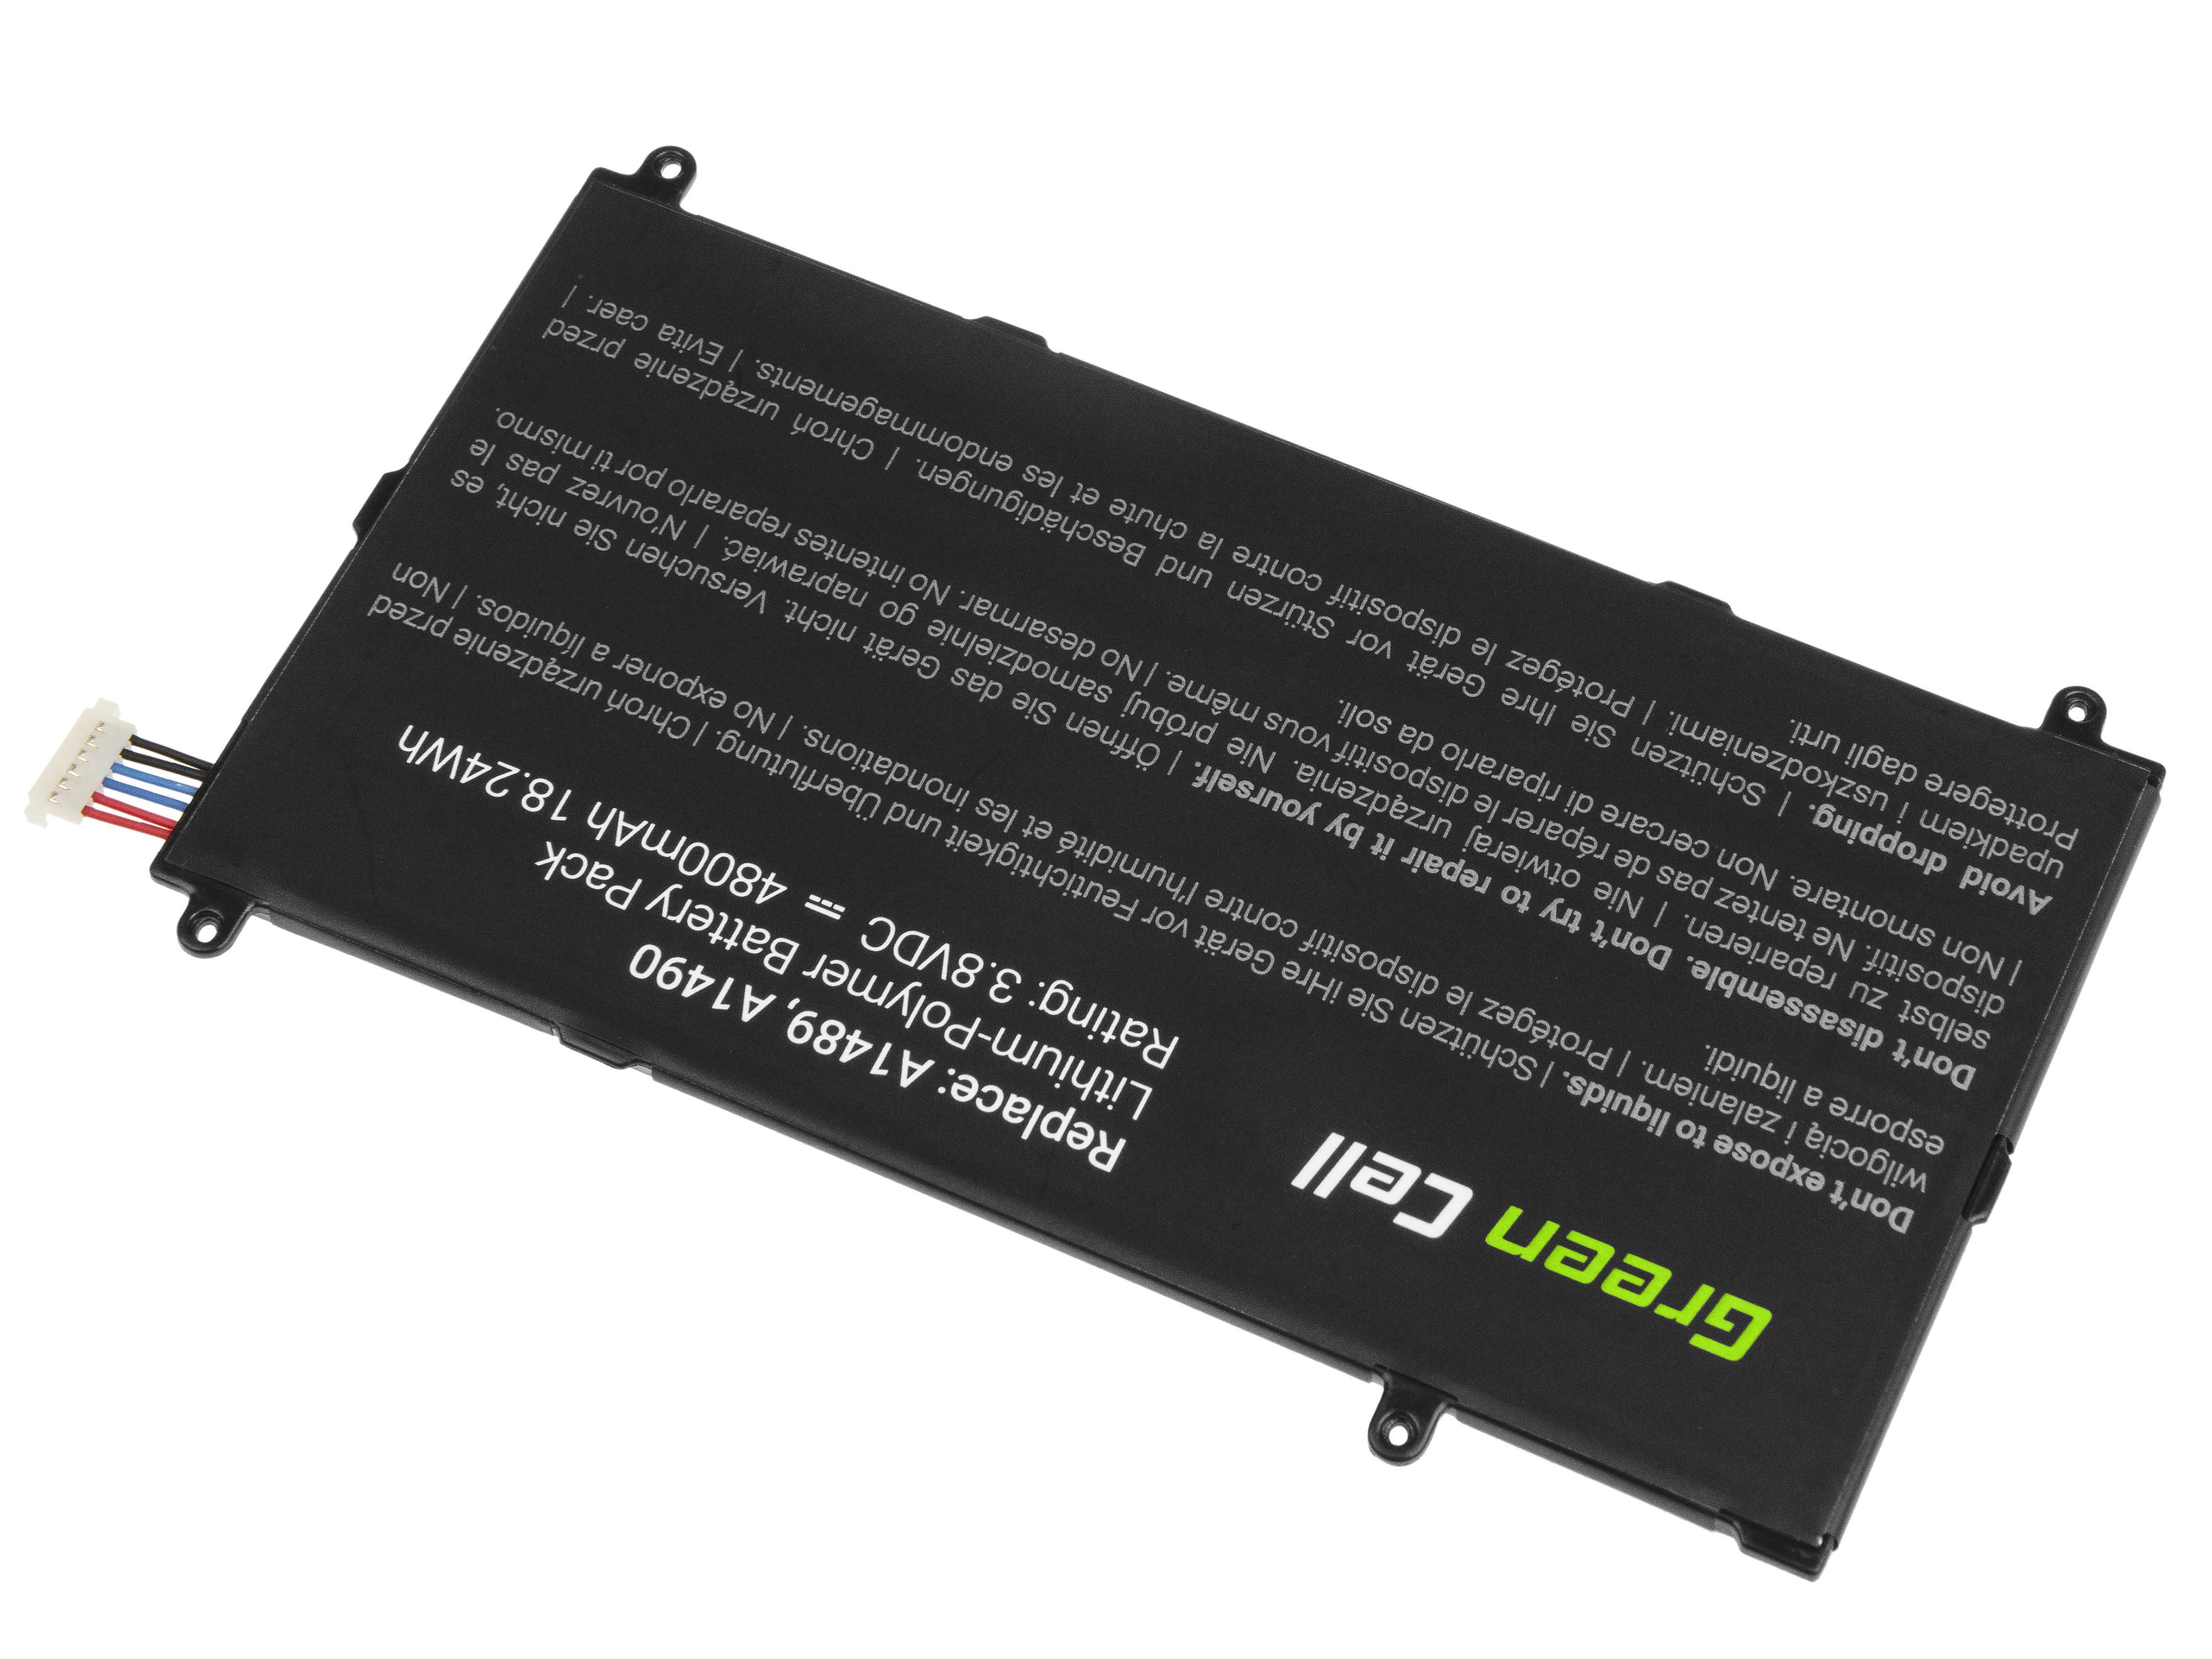 Green Cell TAB34 Baterie Samsung T4800E pro Samsung Galaxy TabPRO 8.4 T320 T321 T325 4800mAh Li-Pol – neoriginální